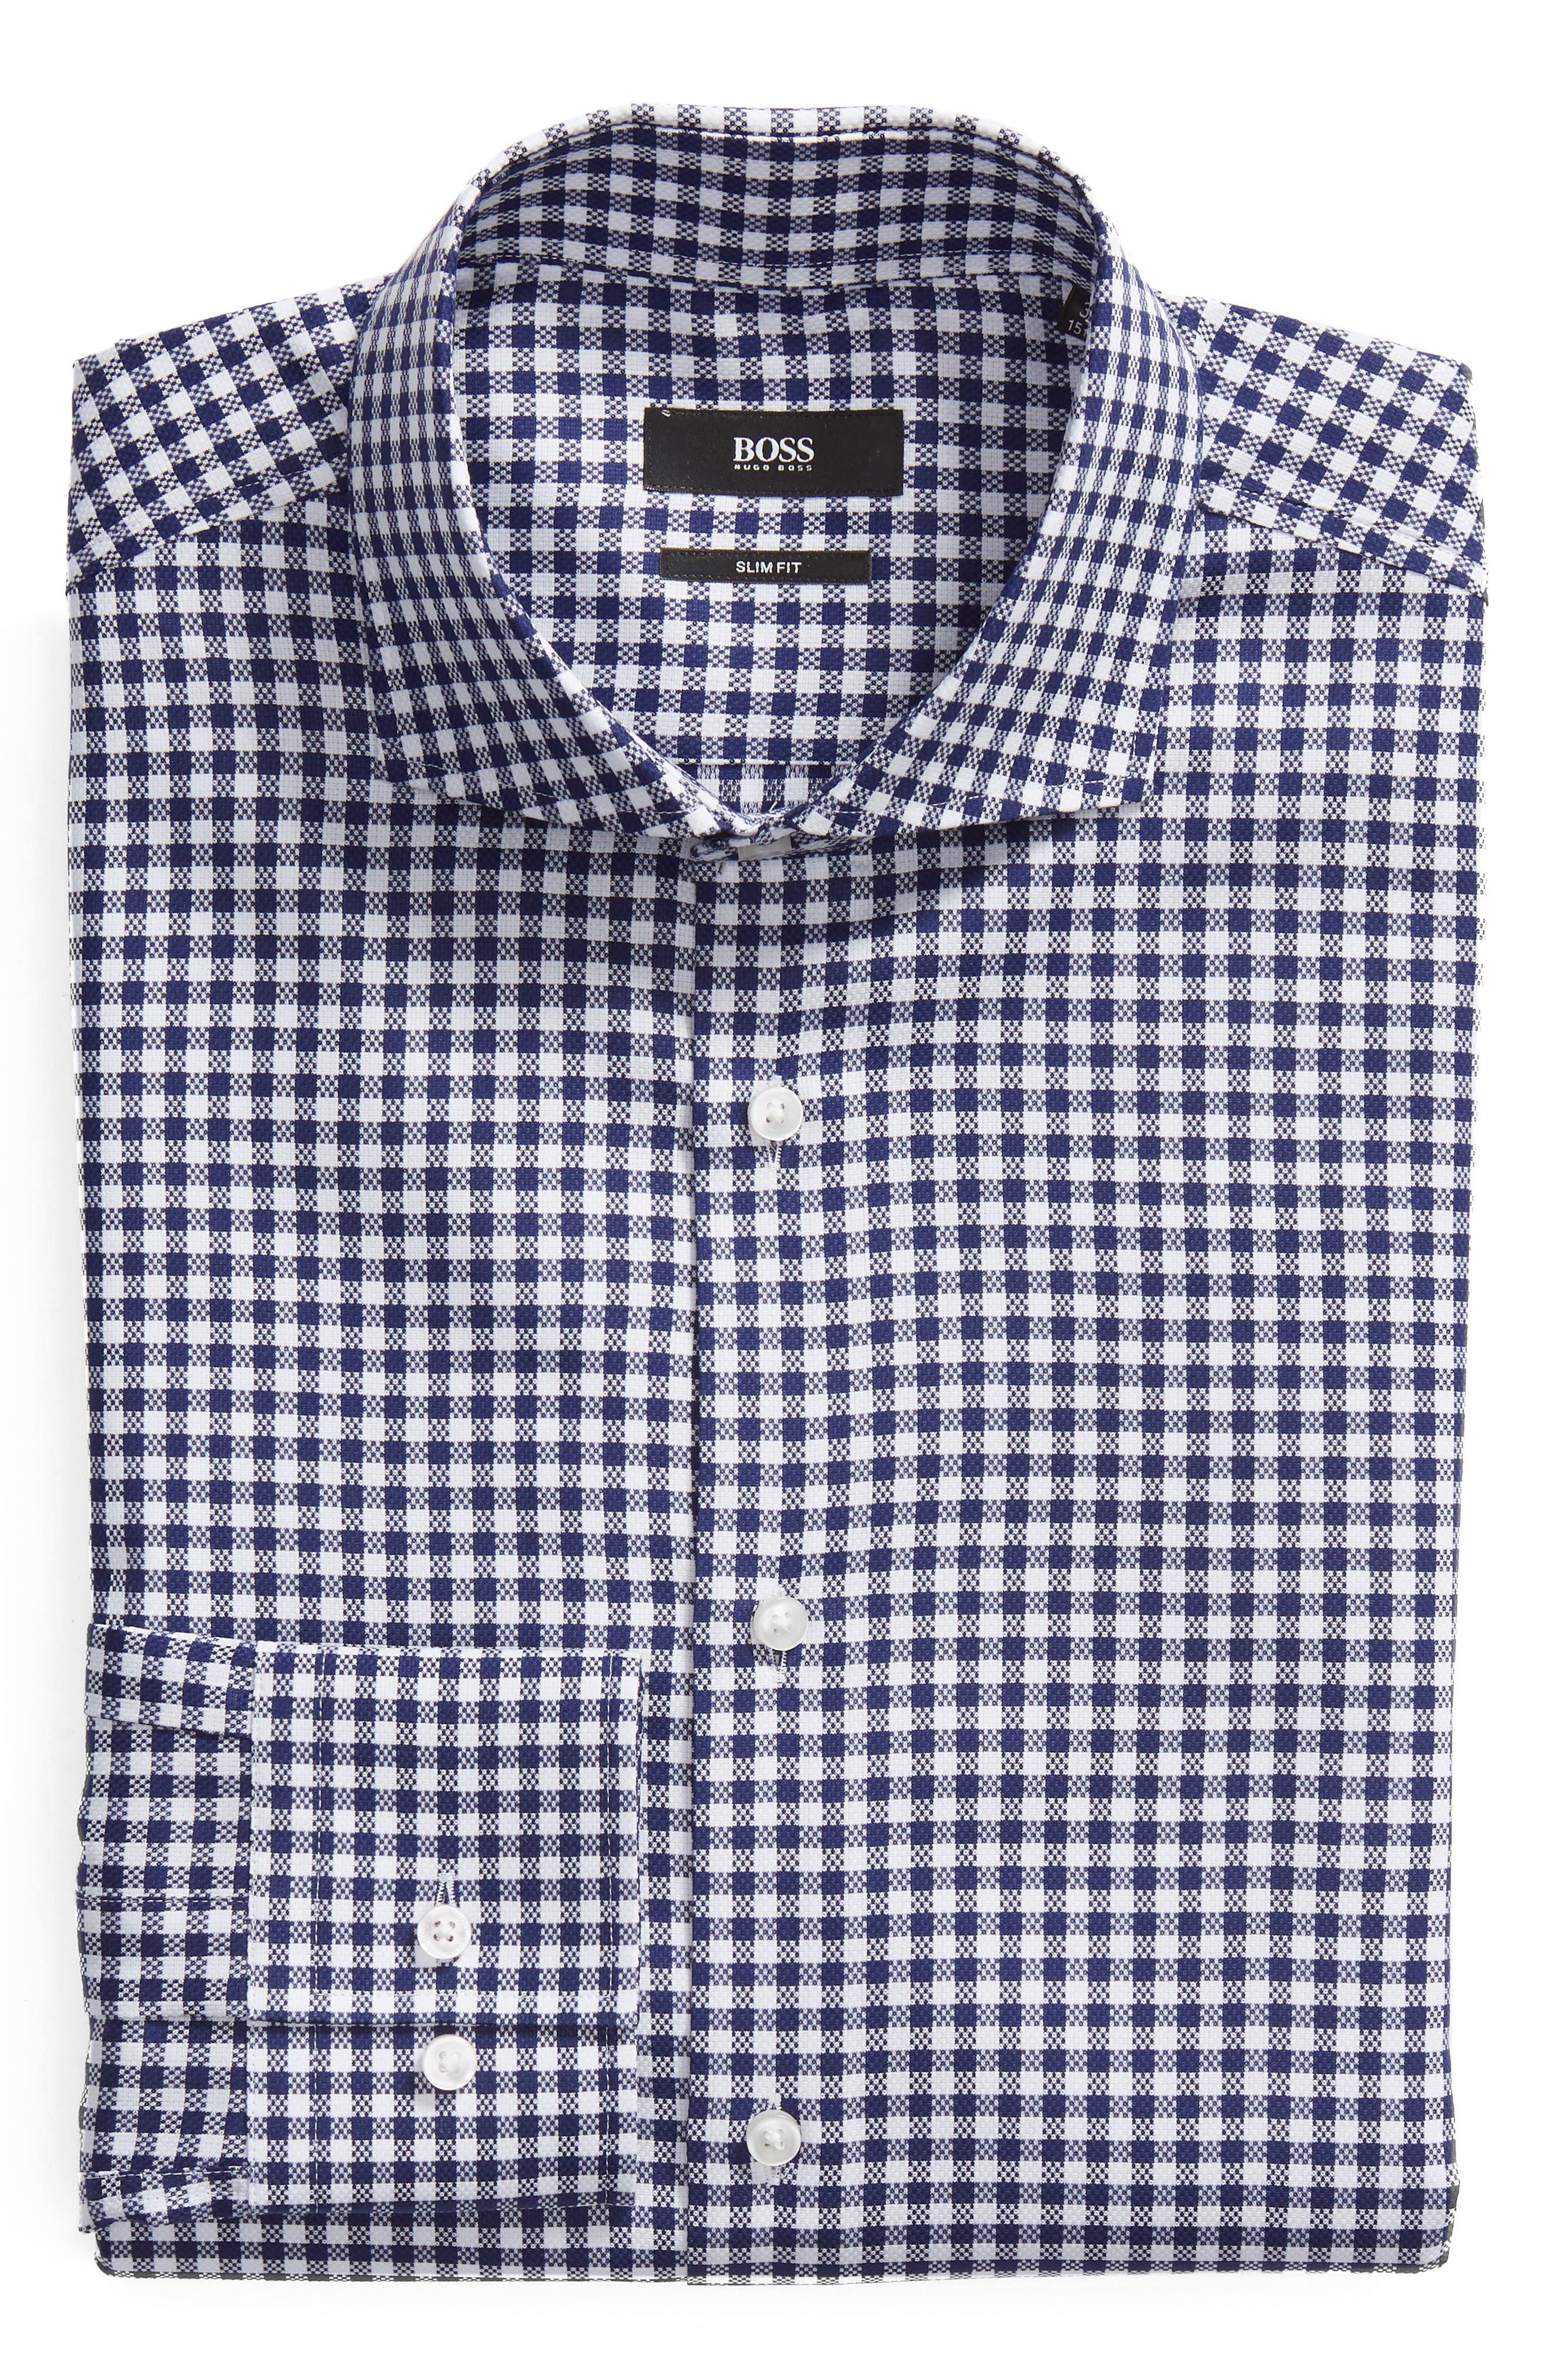 Jason Slim Fit Check Dress Shirt,                             Alternate thumbnail 5, color,                             NAVY